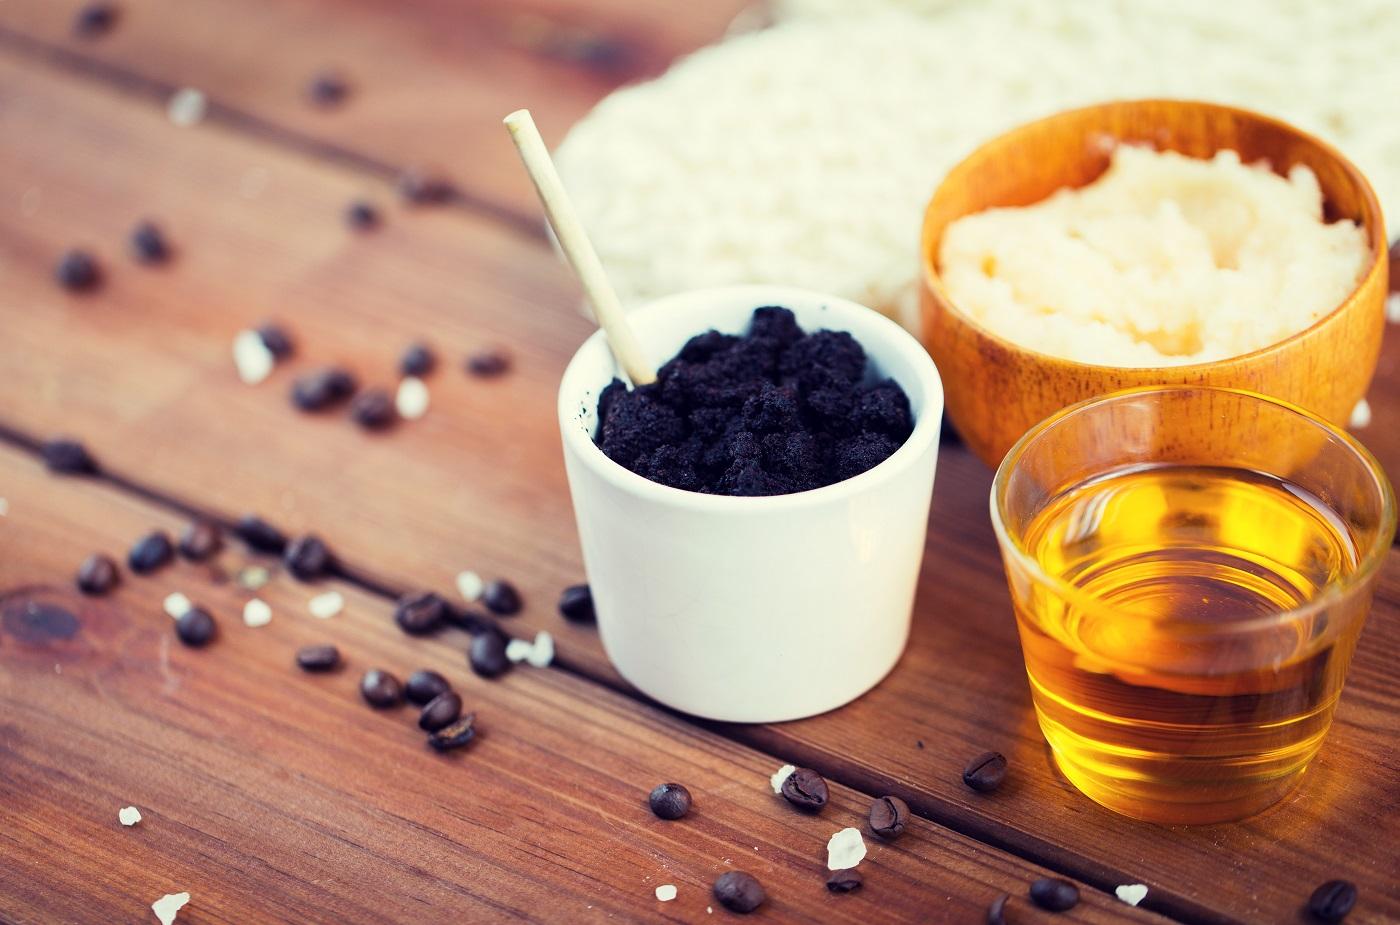 cafe-esfoliante-iogurte-receita-mipmed